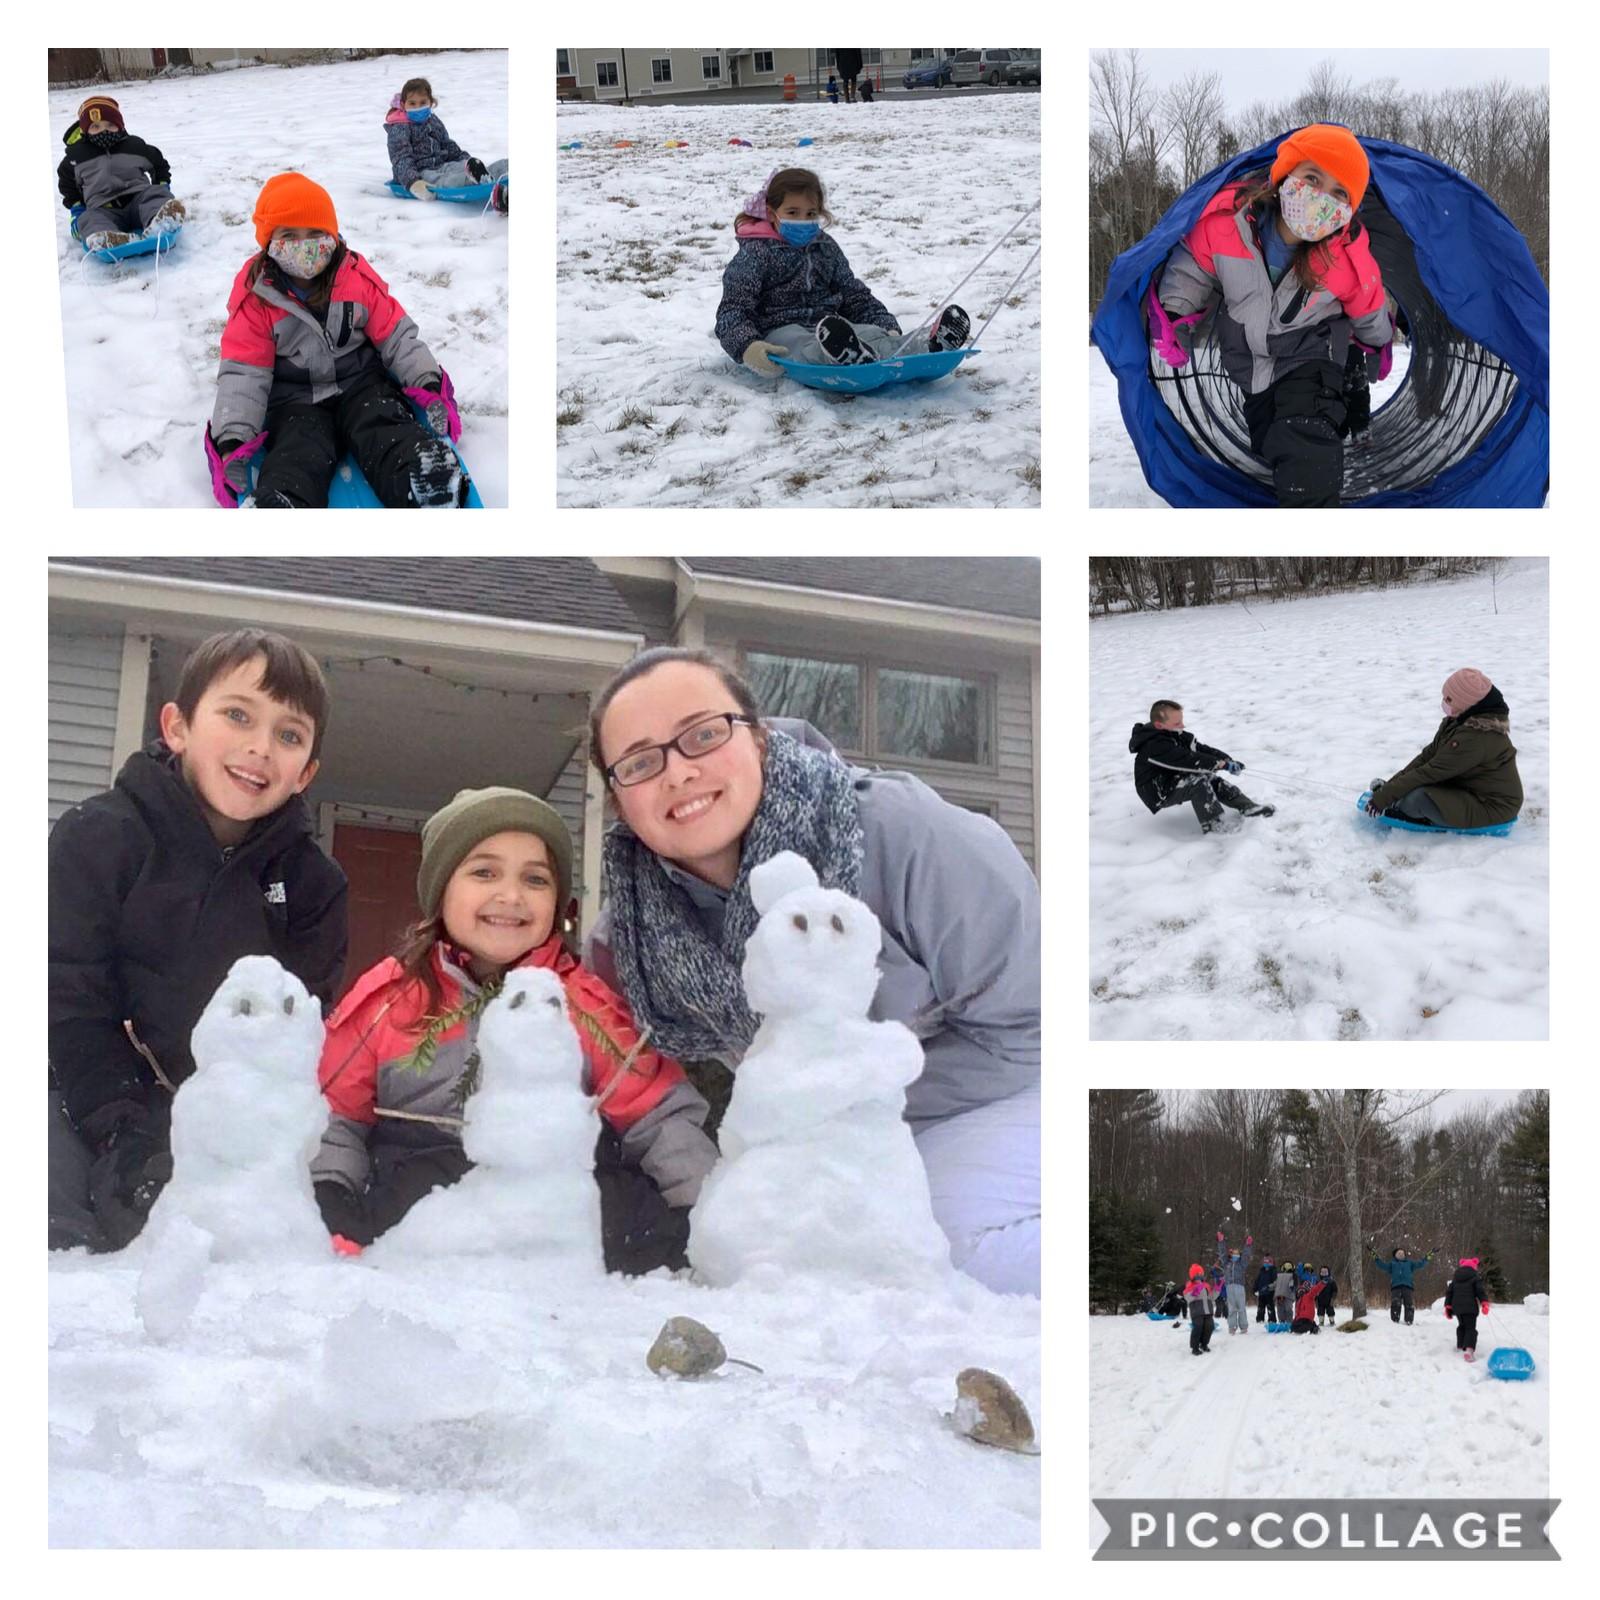 Kindergarten Leroy Smith Week 3 Winter Games 2021 Moment of the Week